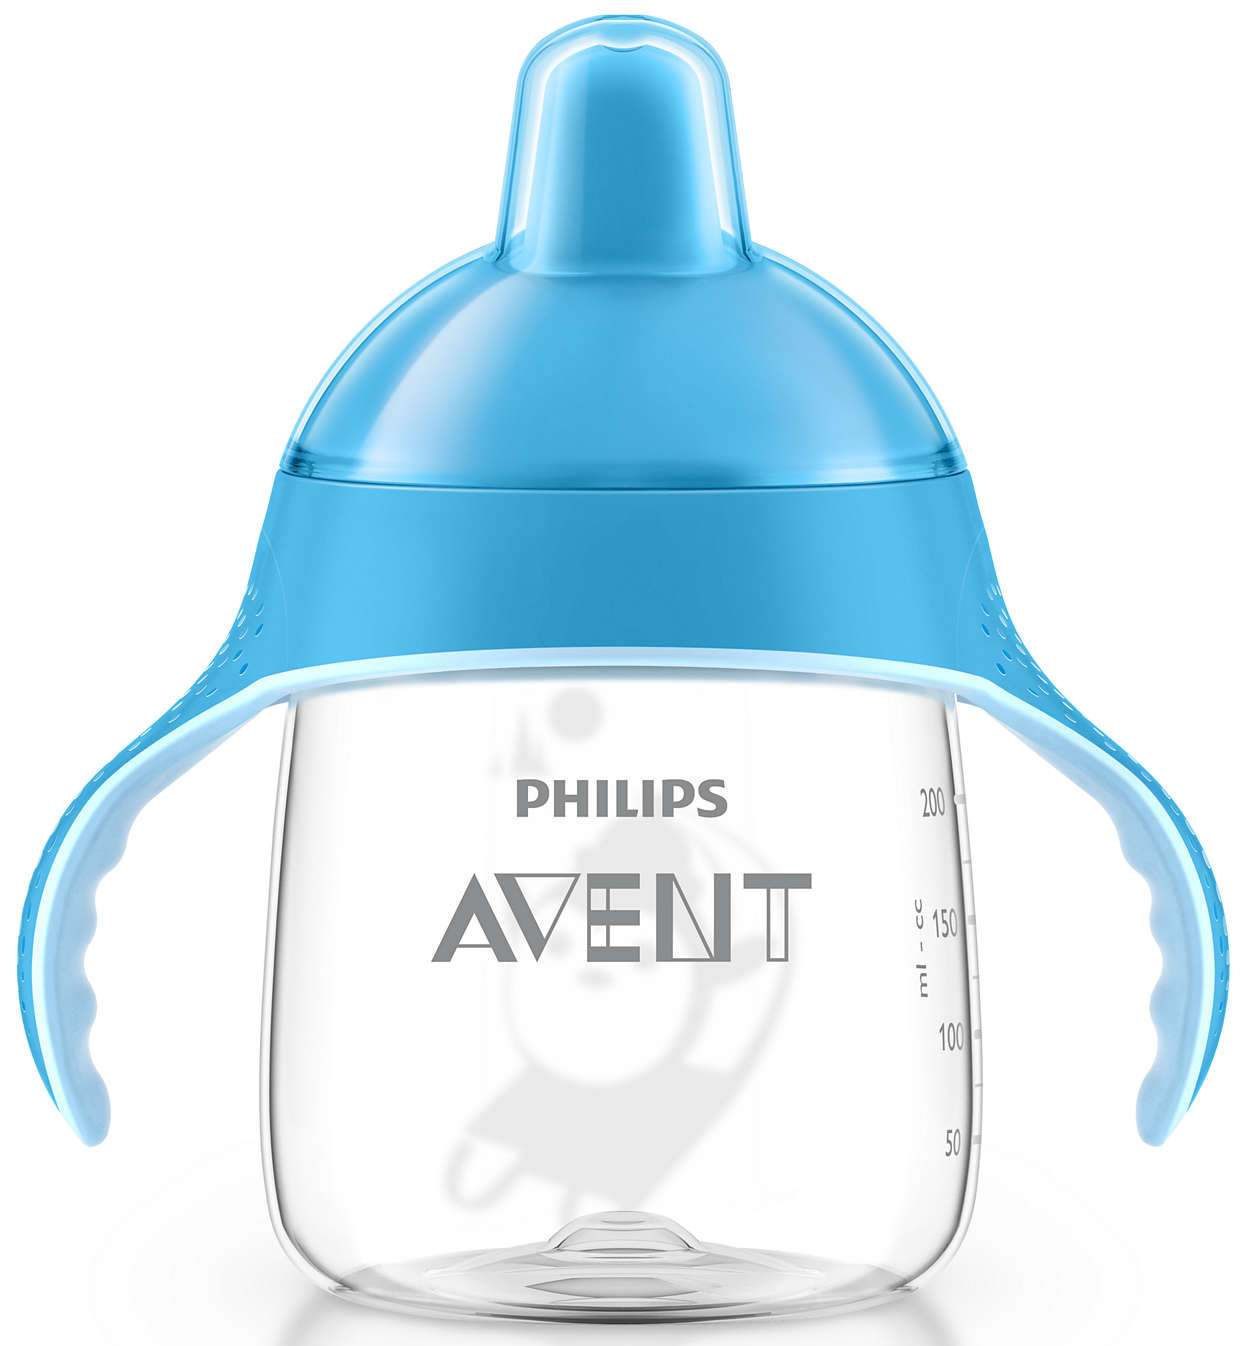 Avent Κύπελλο με Λαβές και Στόμιο Πλαστικό απο 12 Μηνών+ 260ml 1τεμάχιο SCF753 – μπλέ